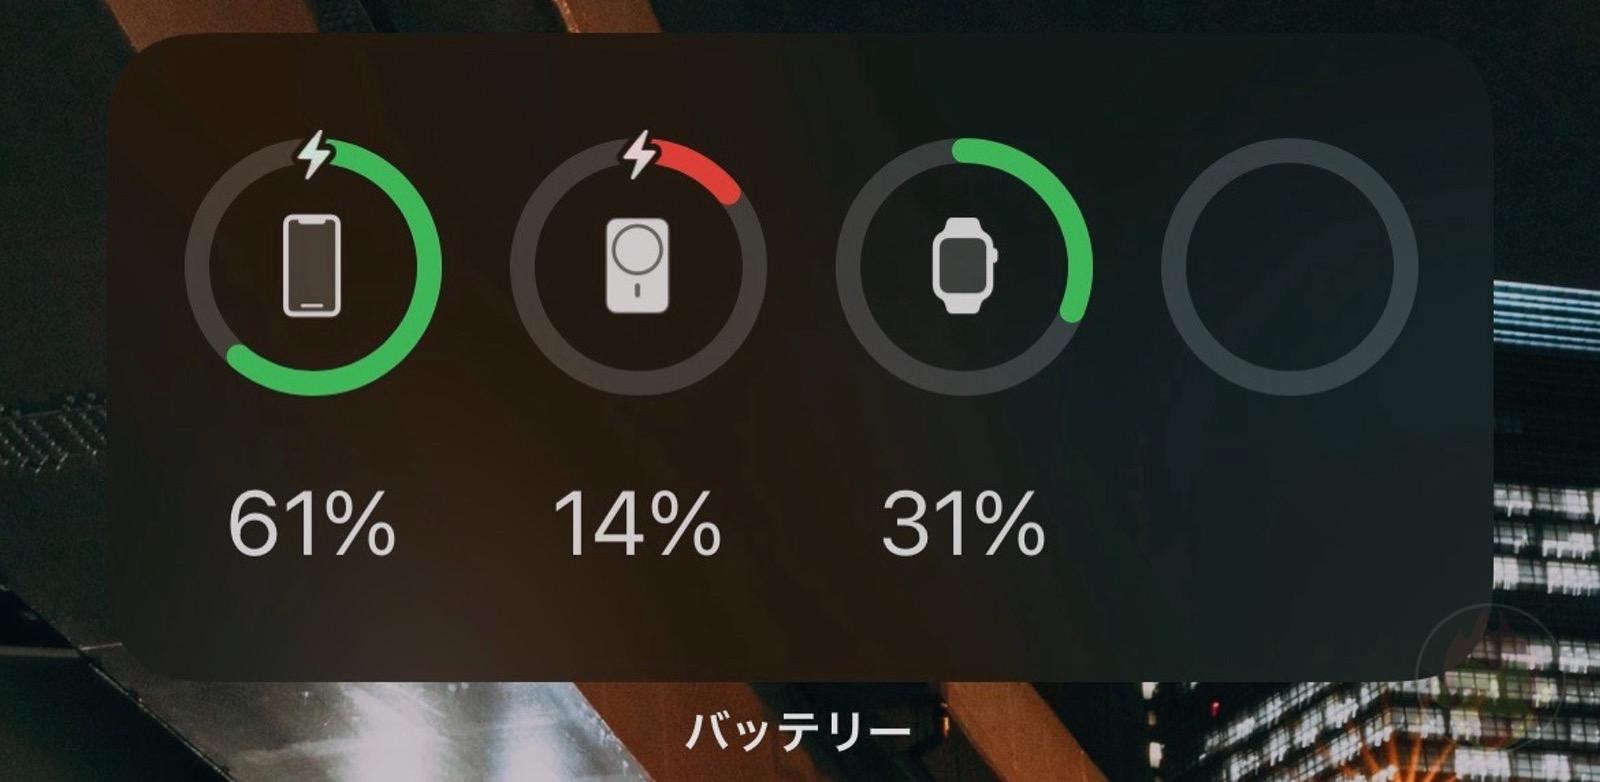 Charging the iphone through MagSafe 01